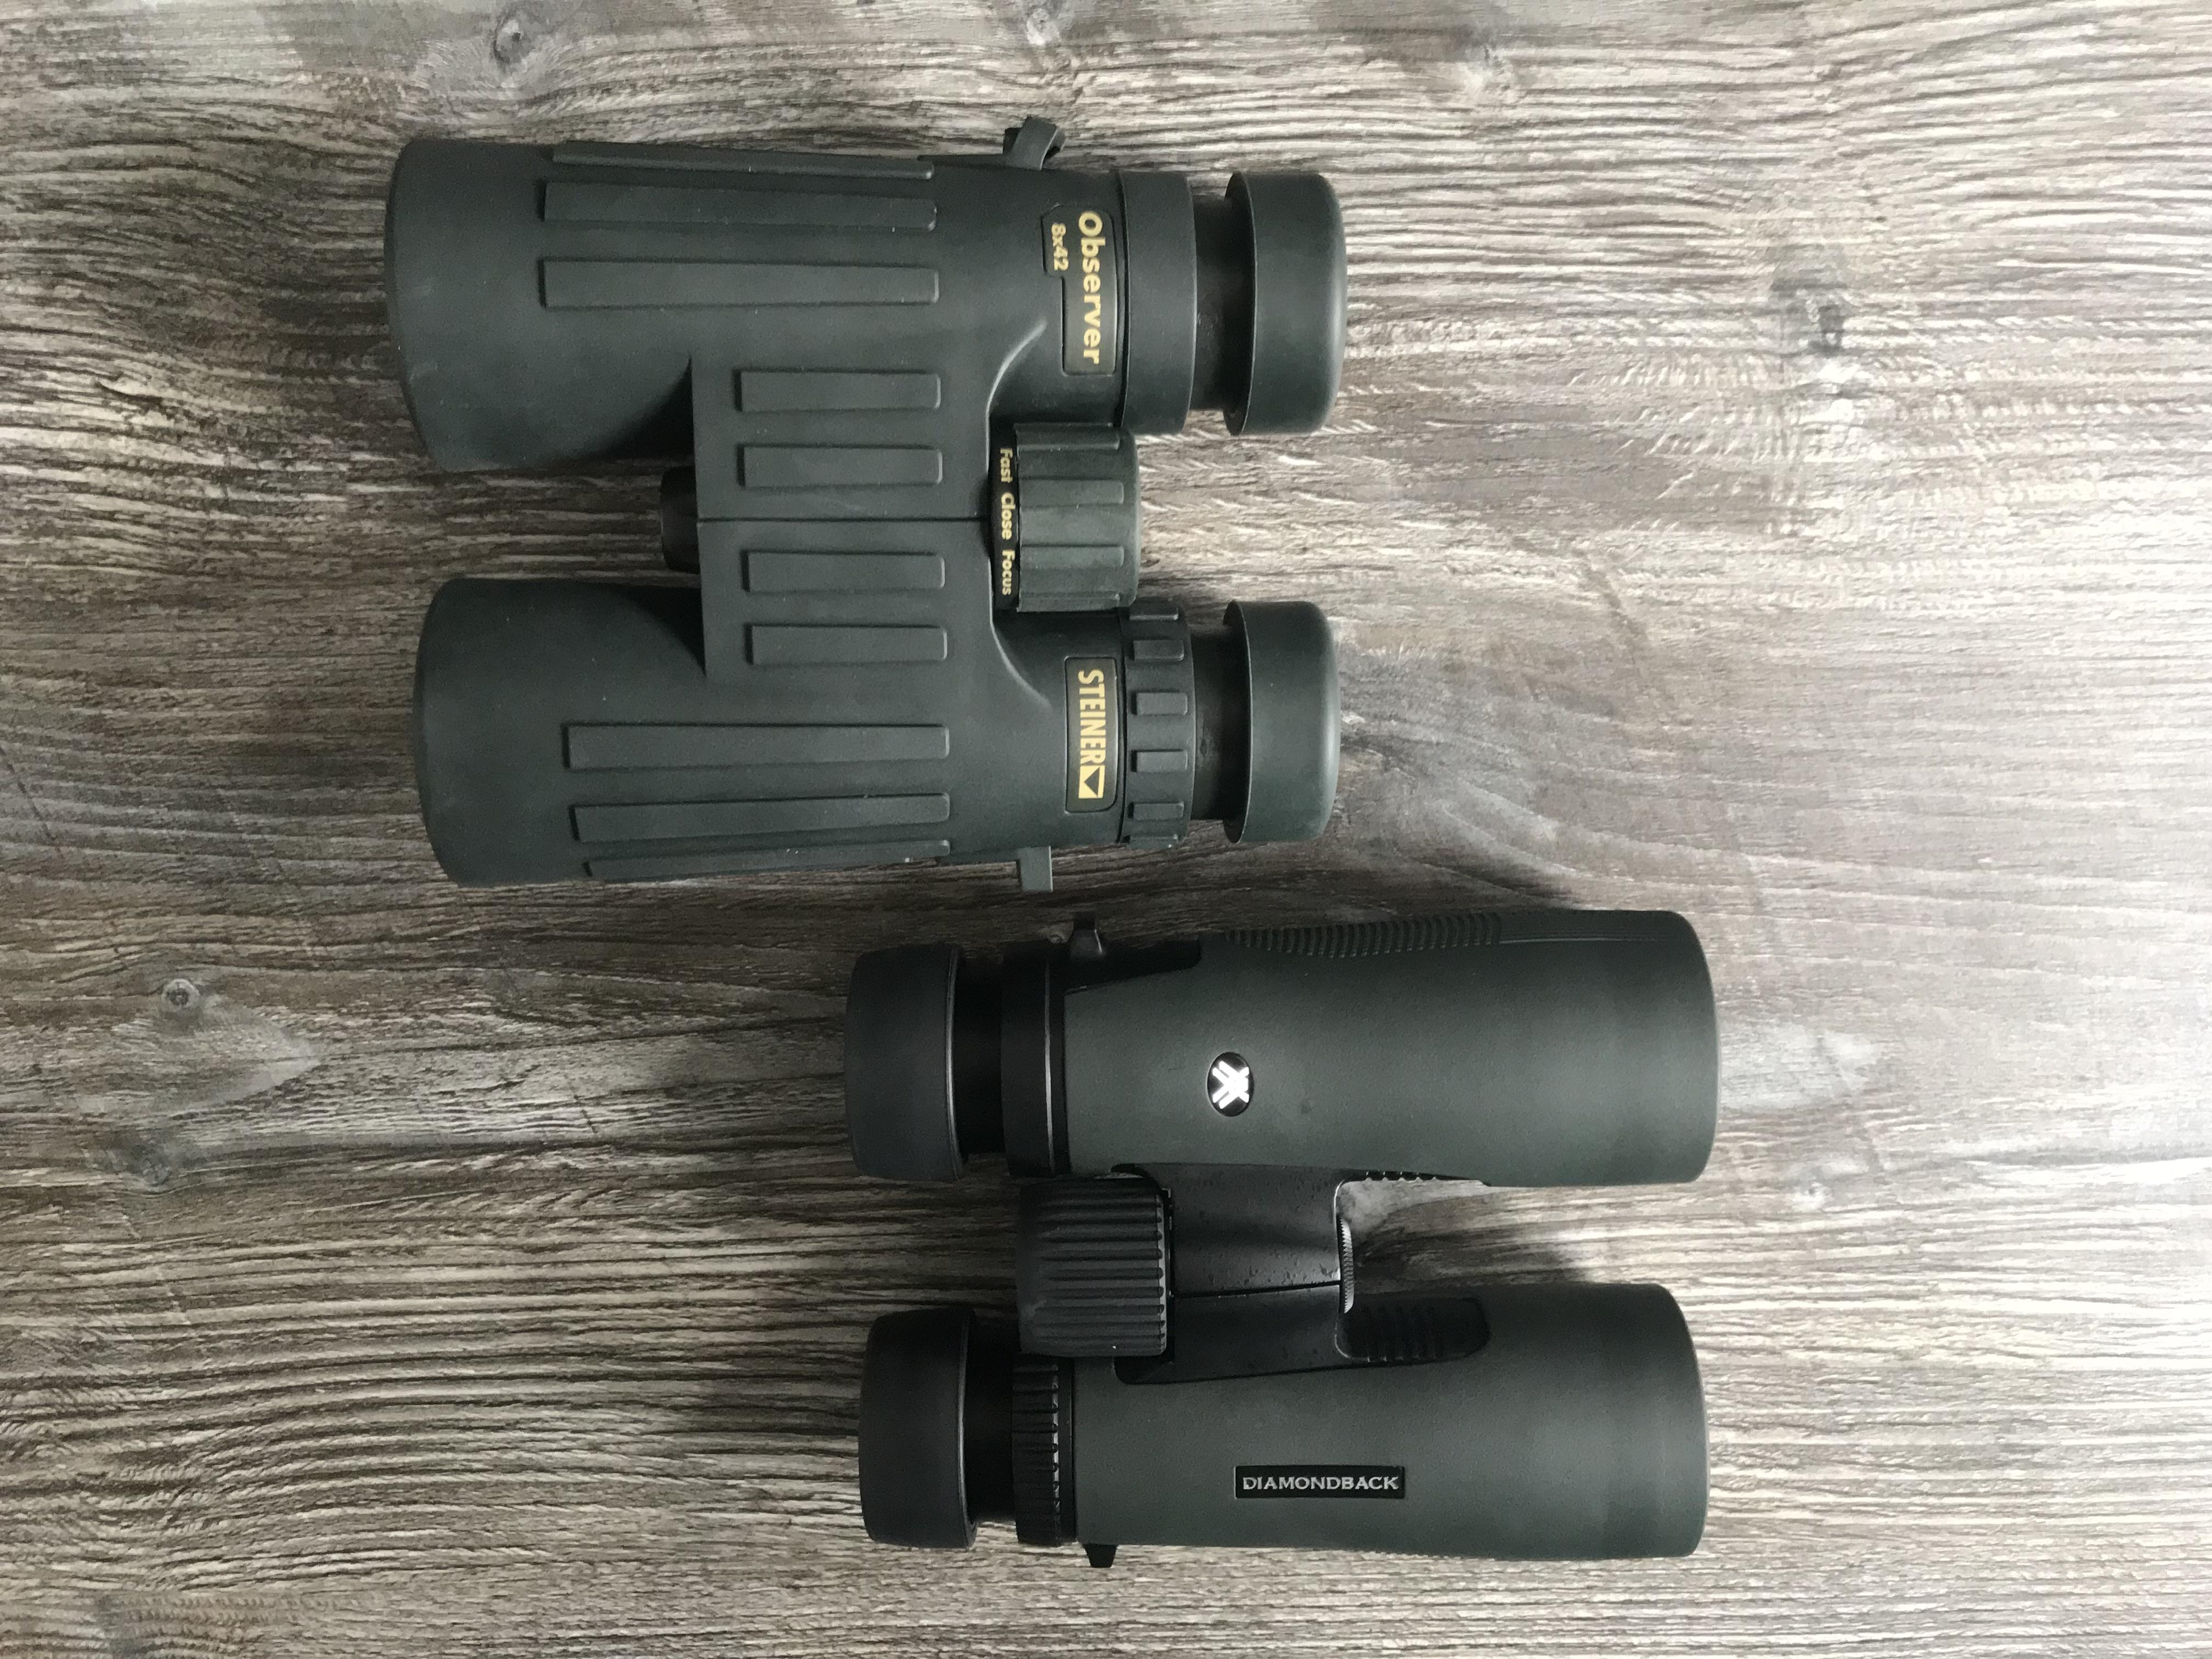 Steiner Observer 8x42 VS. Vortex Diamondback 8x42